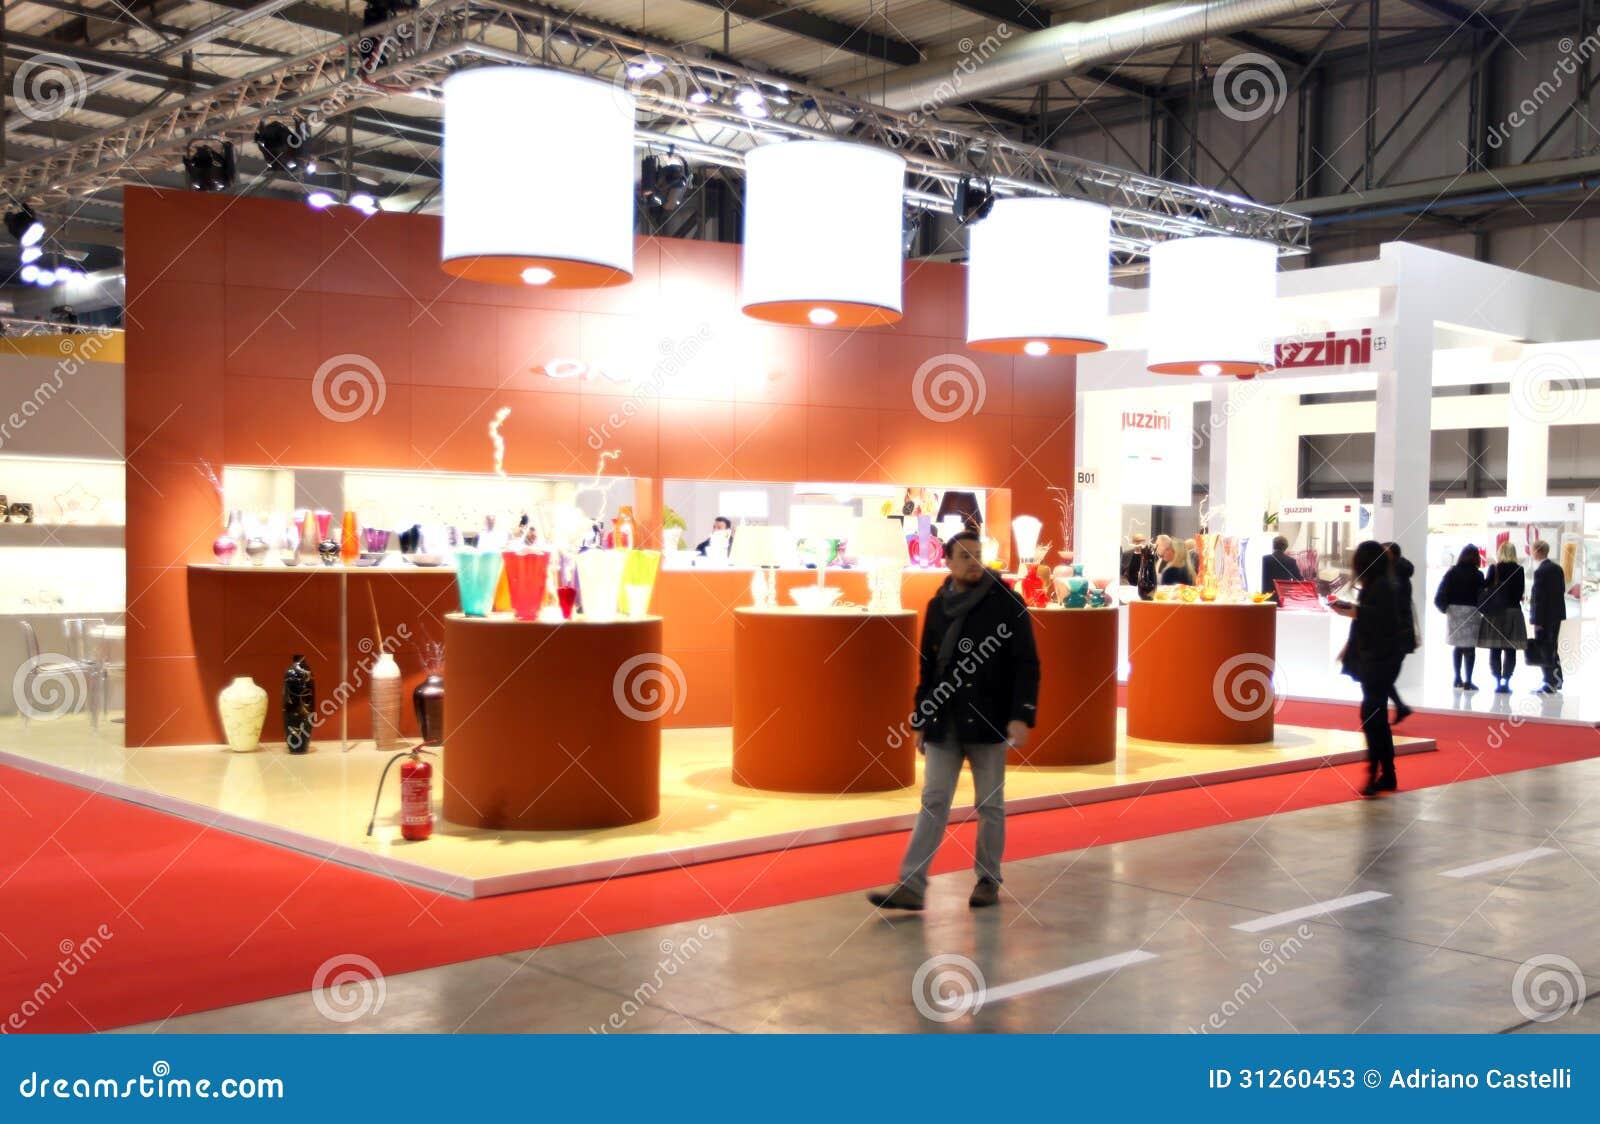 Macef 2013 international home show exhibition editorial stock photo image 31260453 for International interior design exhibition